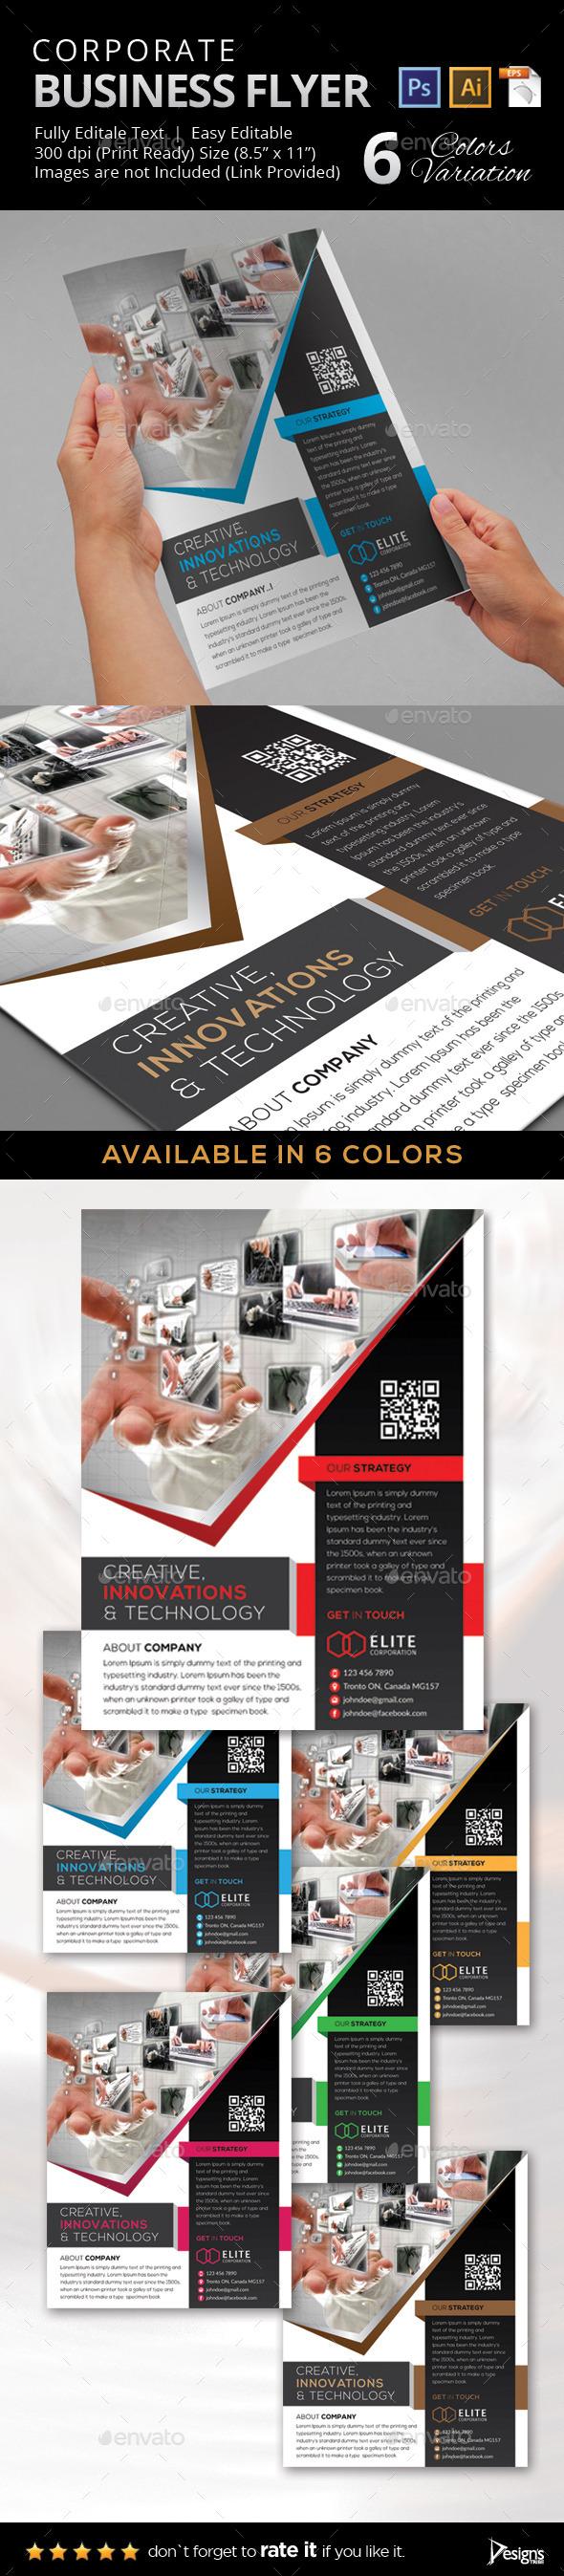 Multipurpose Business Flyer 33 - Flyers Print Templates